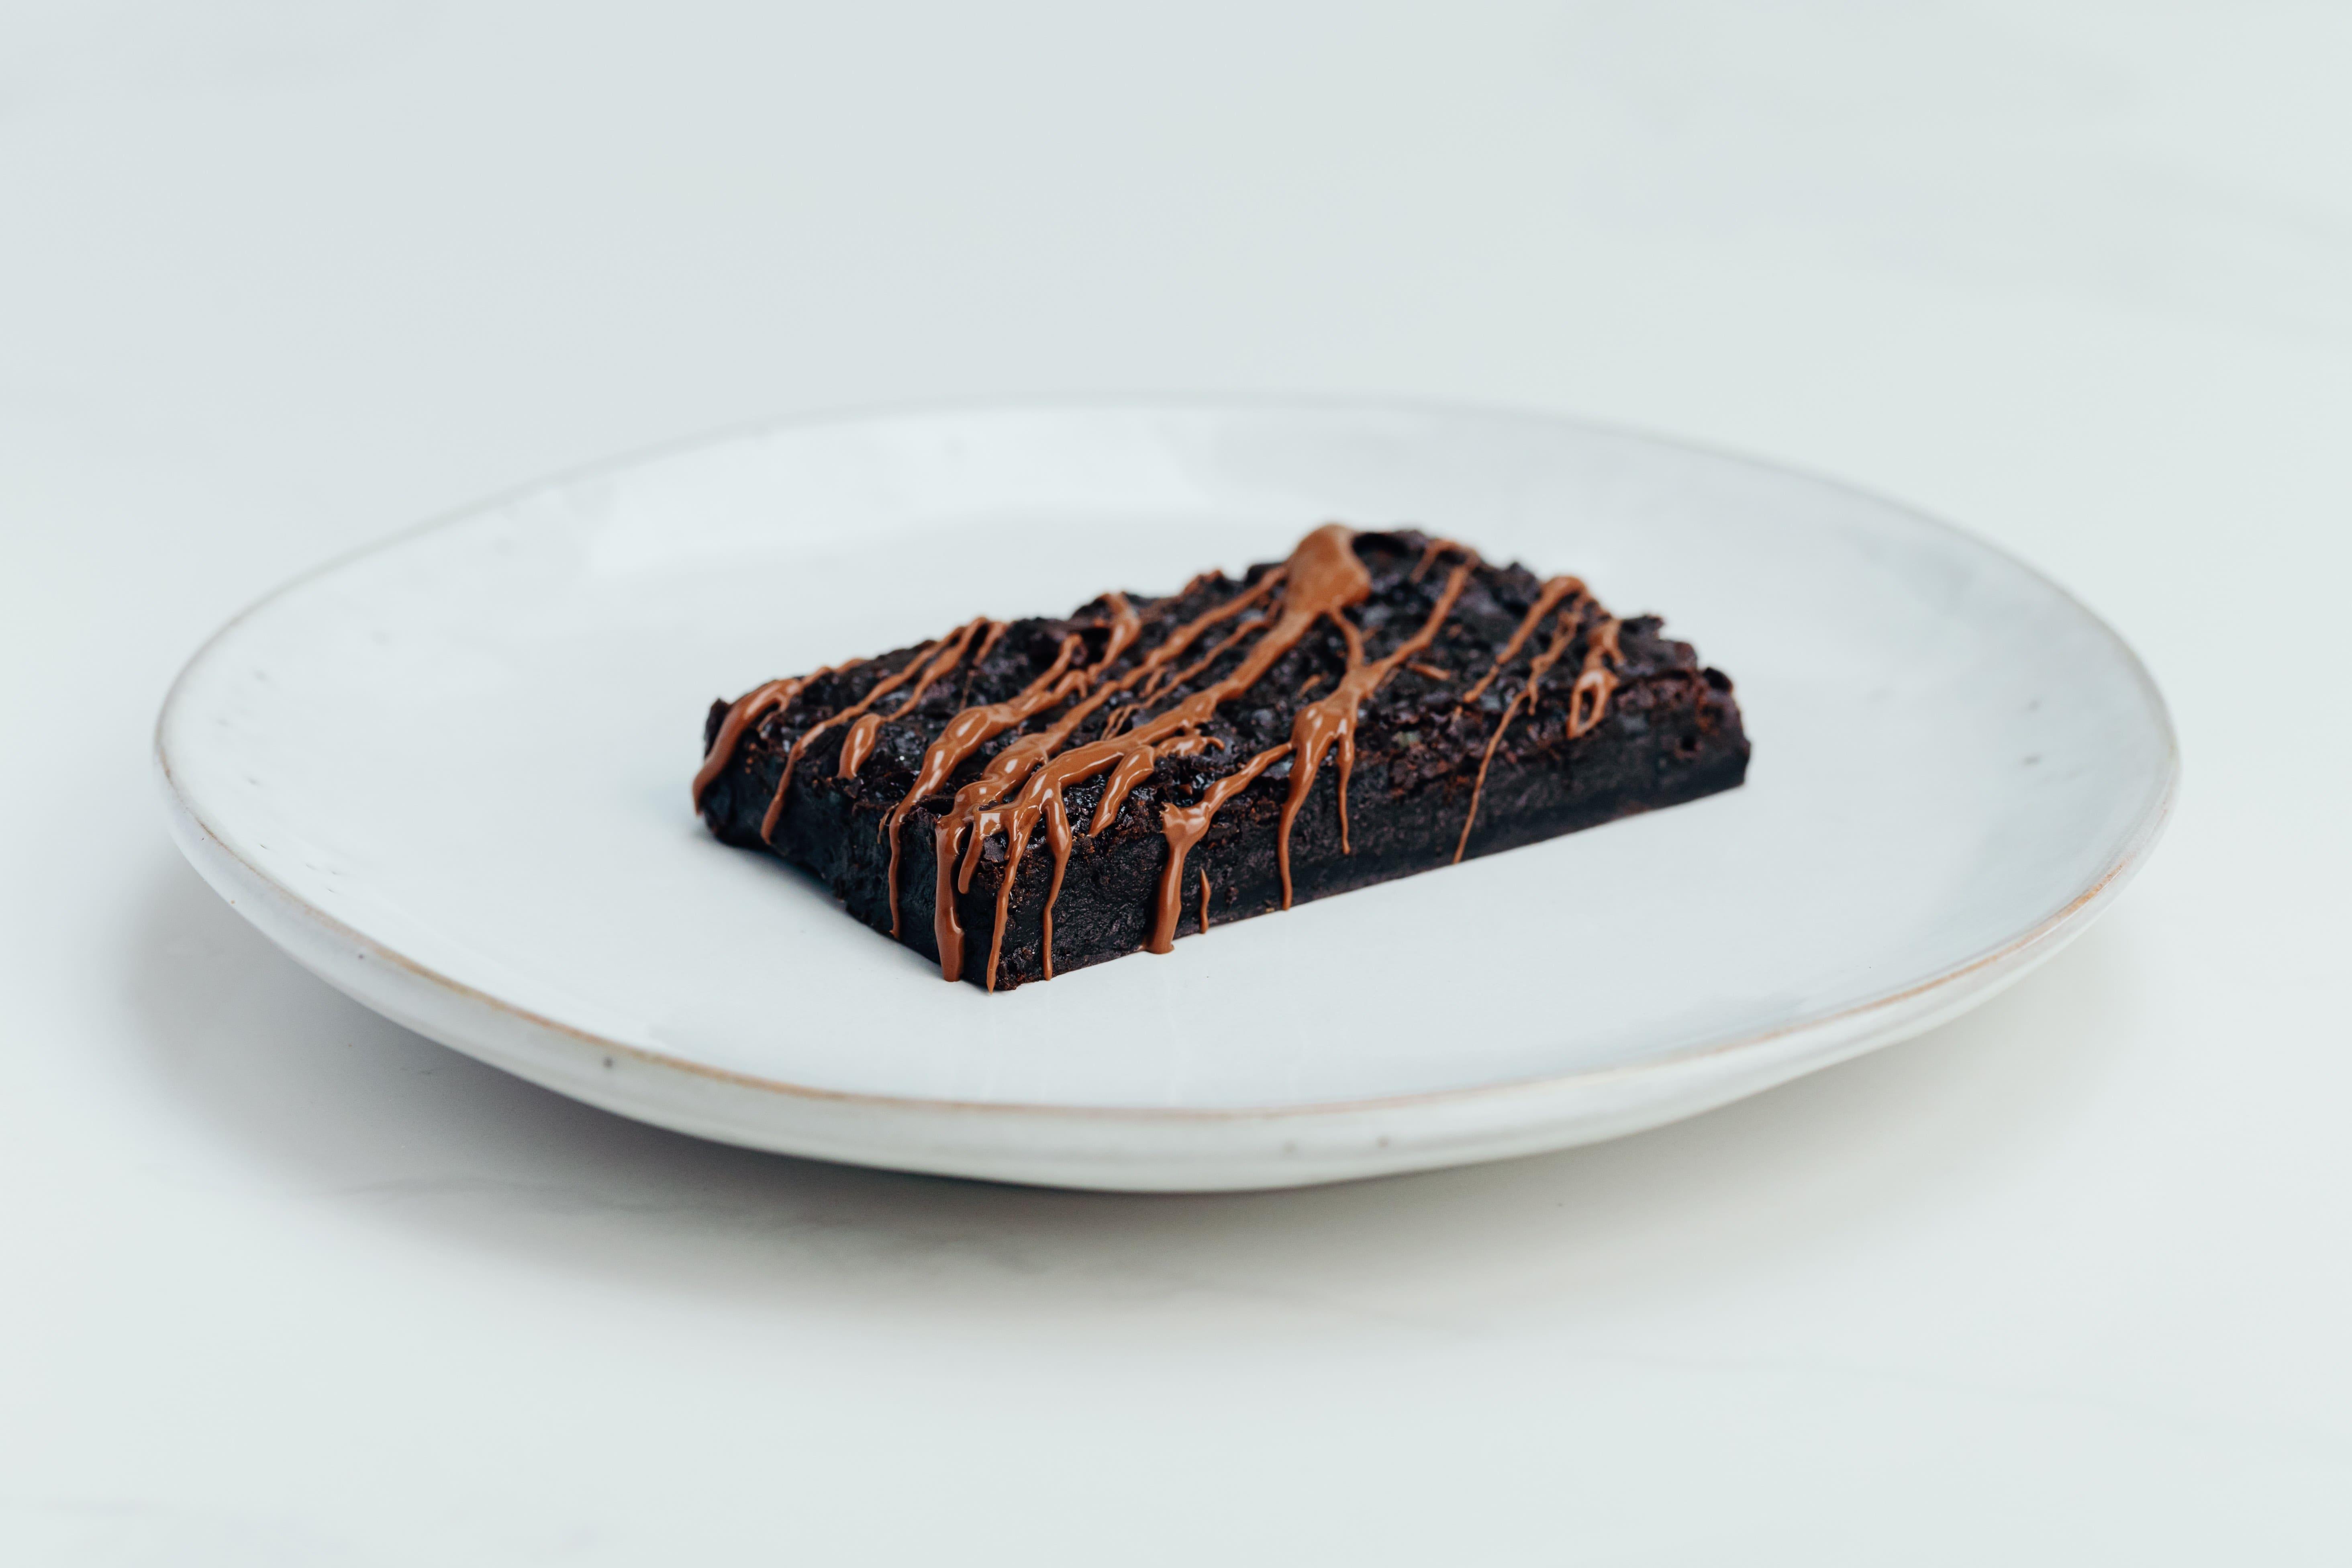 V & G/F Signature Chocolate